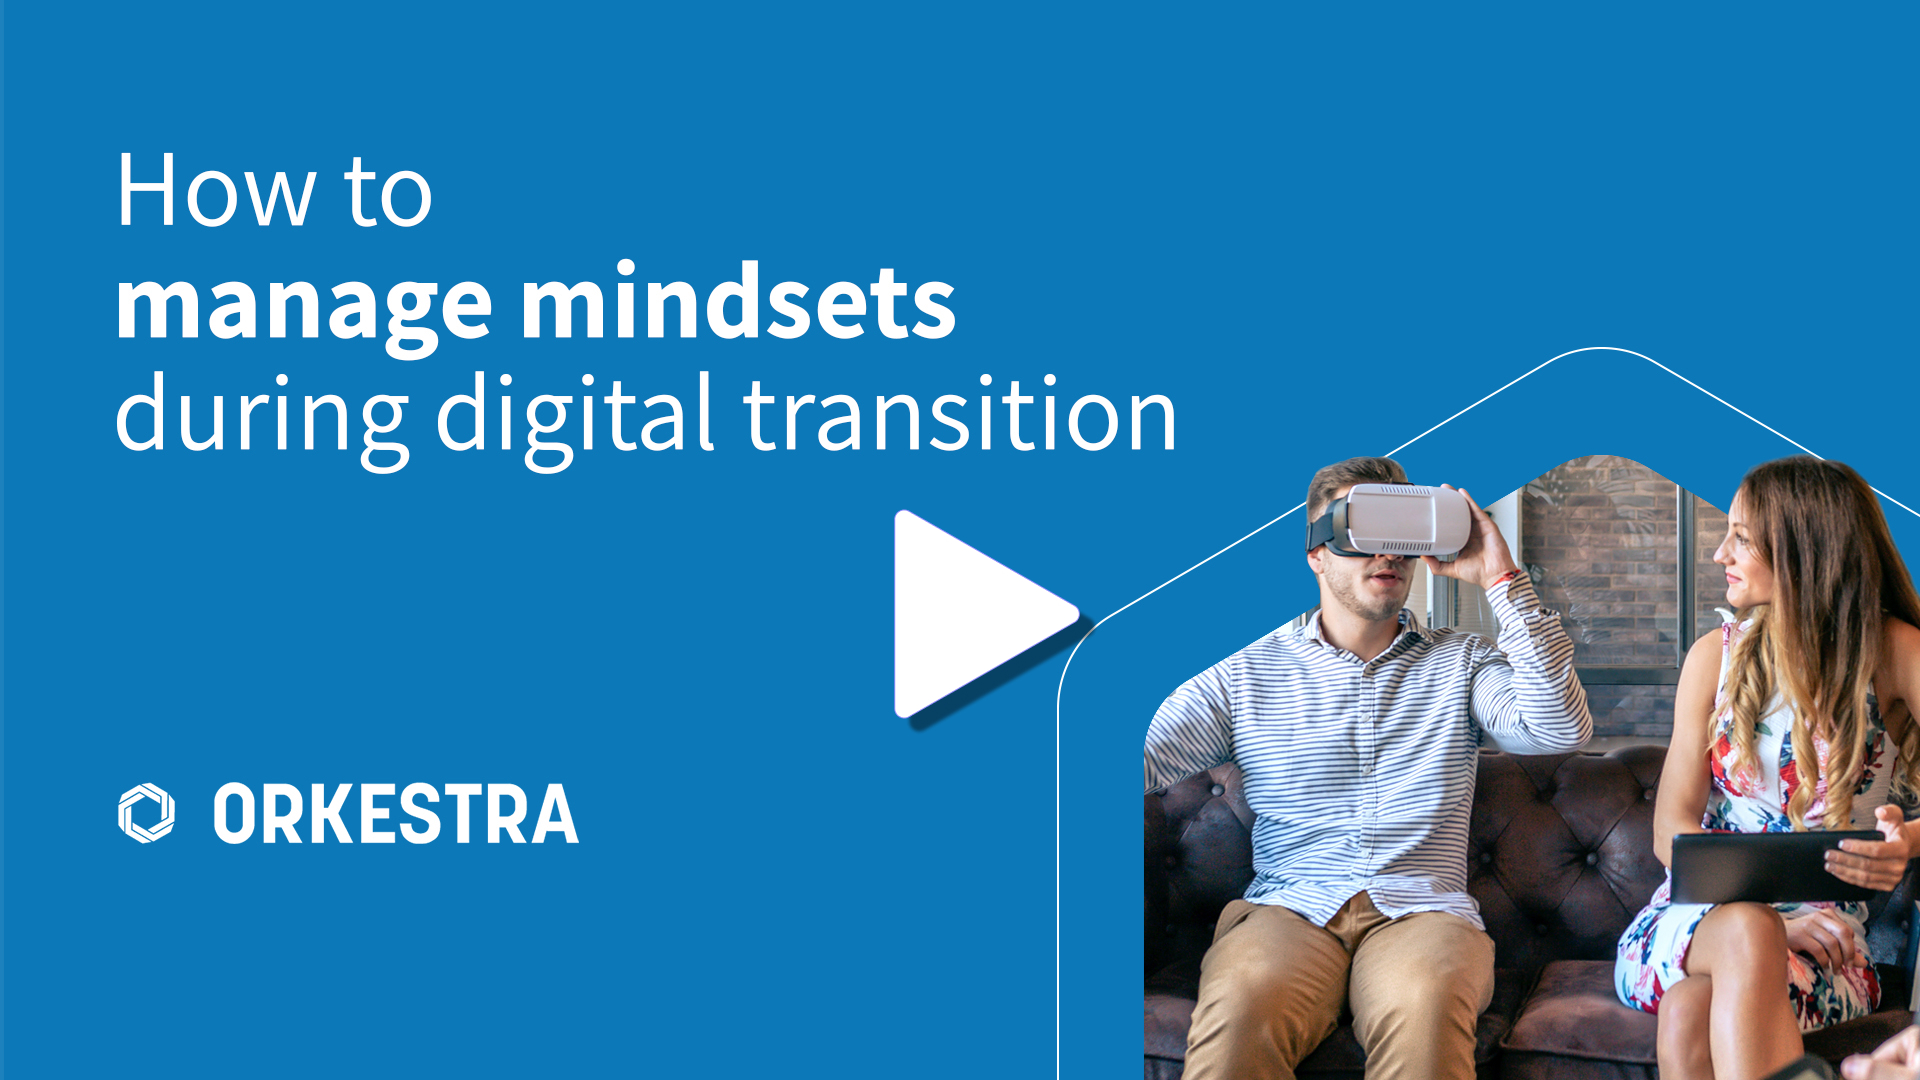 Understand how you can adjust mindsets during a digital transformation.